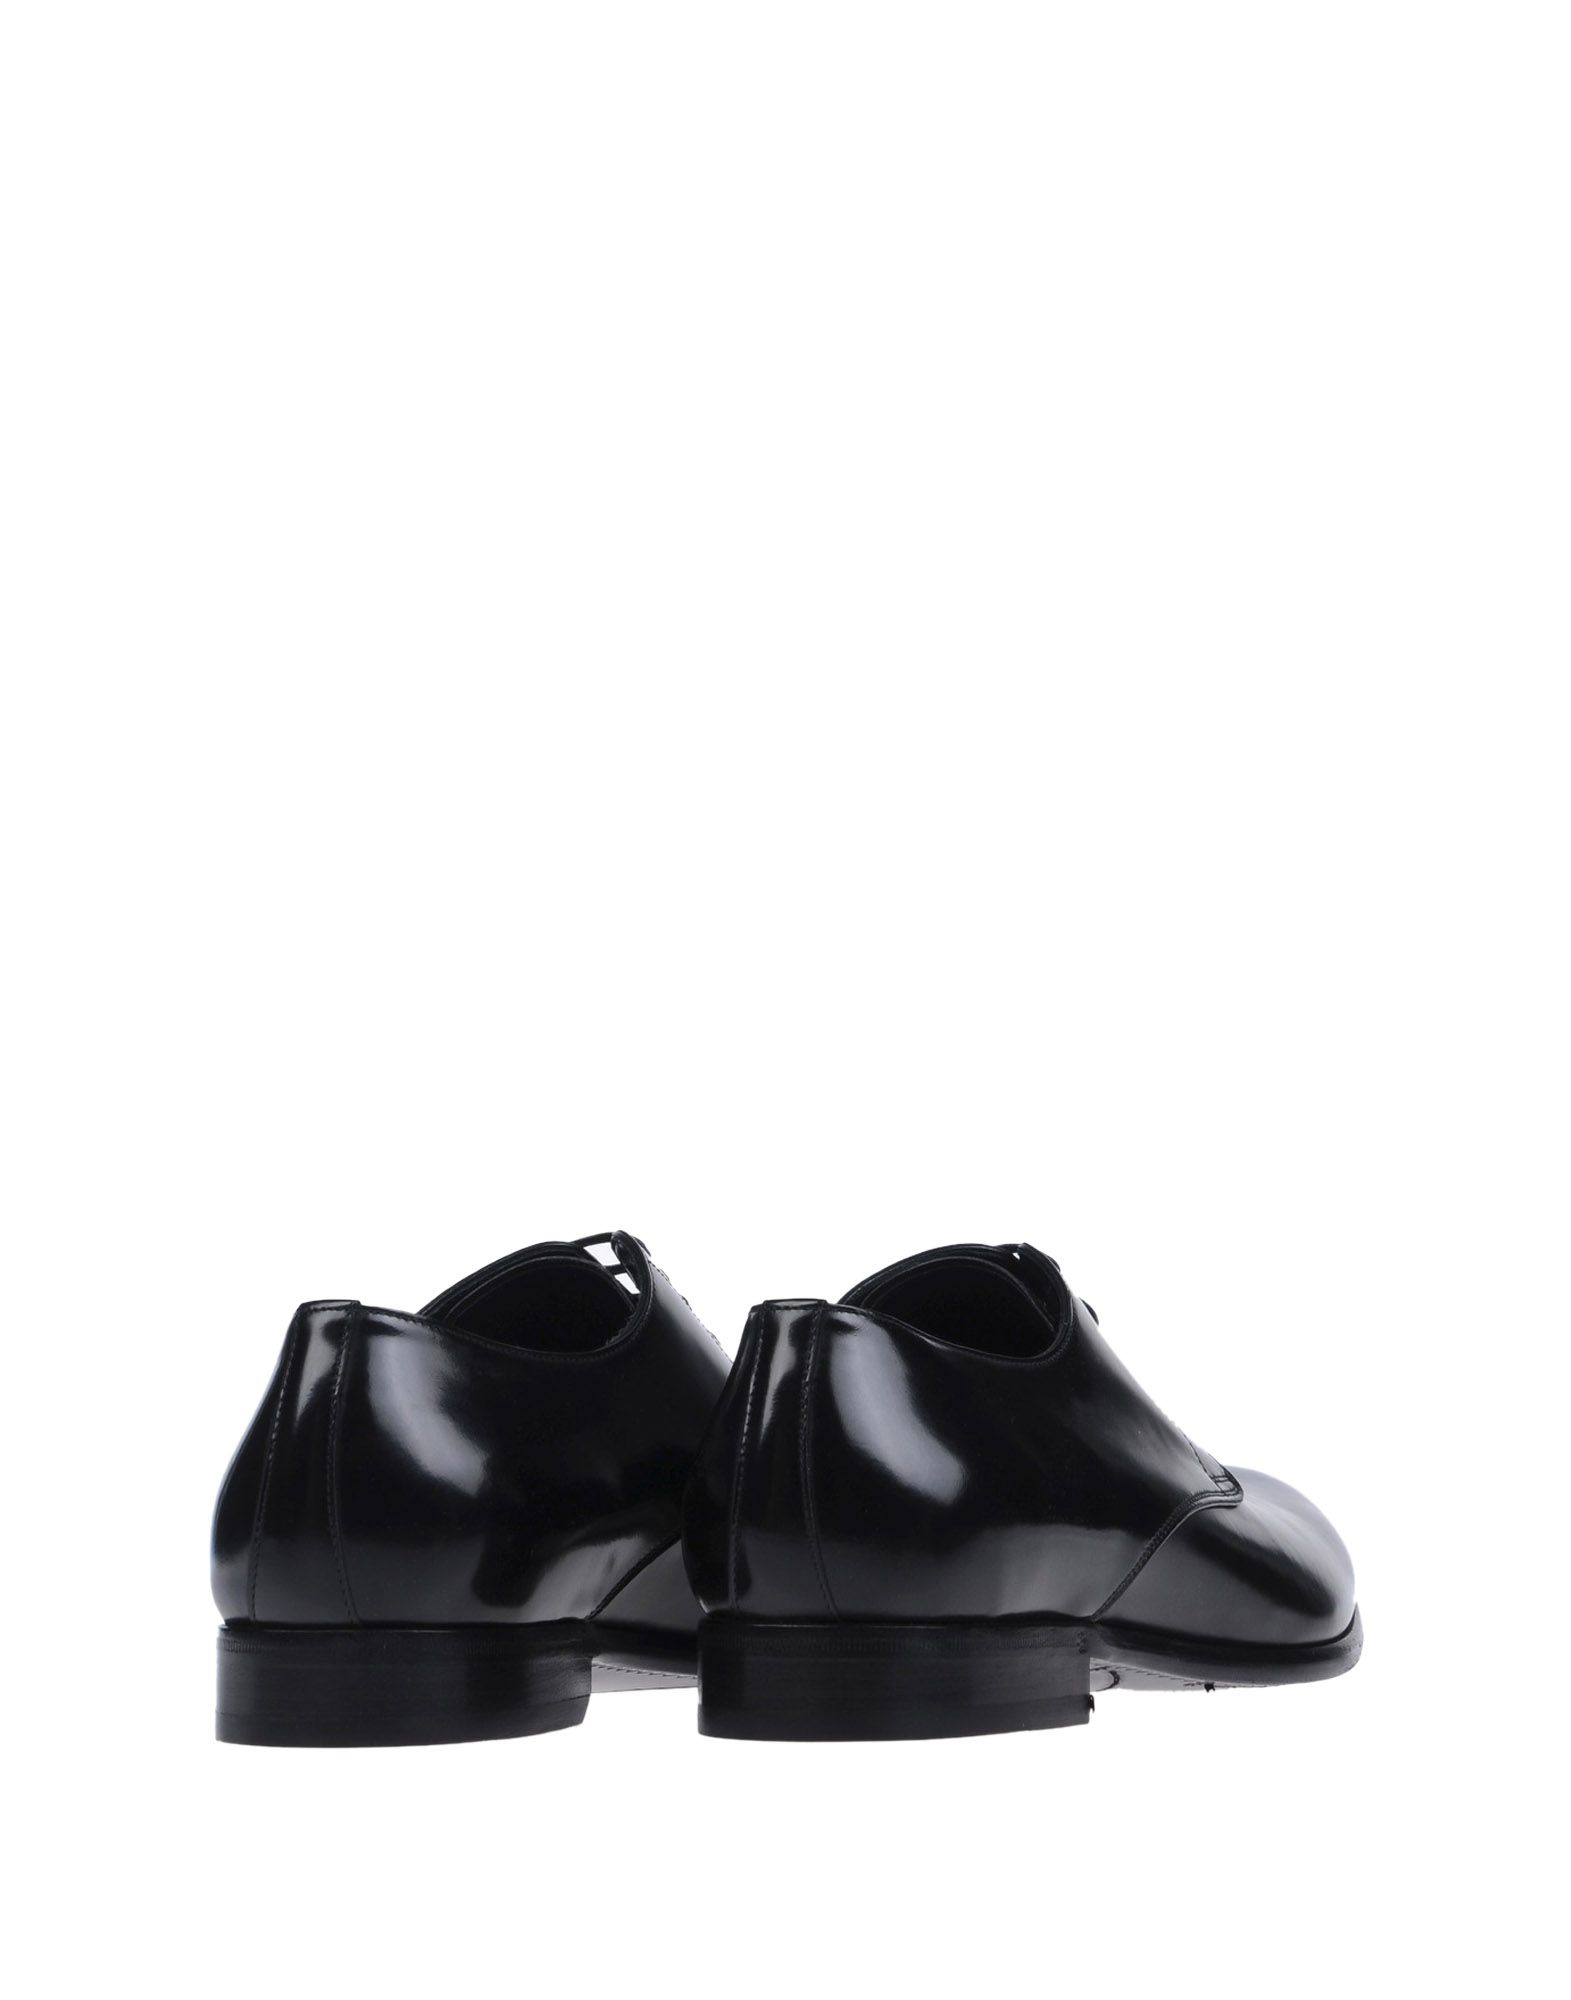 Dolce & Gabbana  Schnürschuhe Herren  Gabbana 11232556JL 67f49d